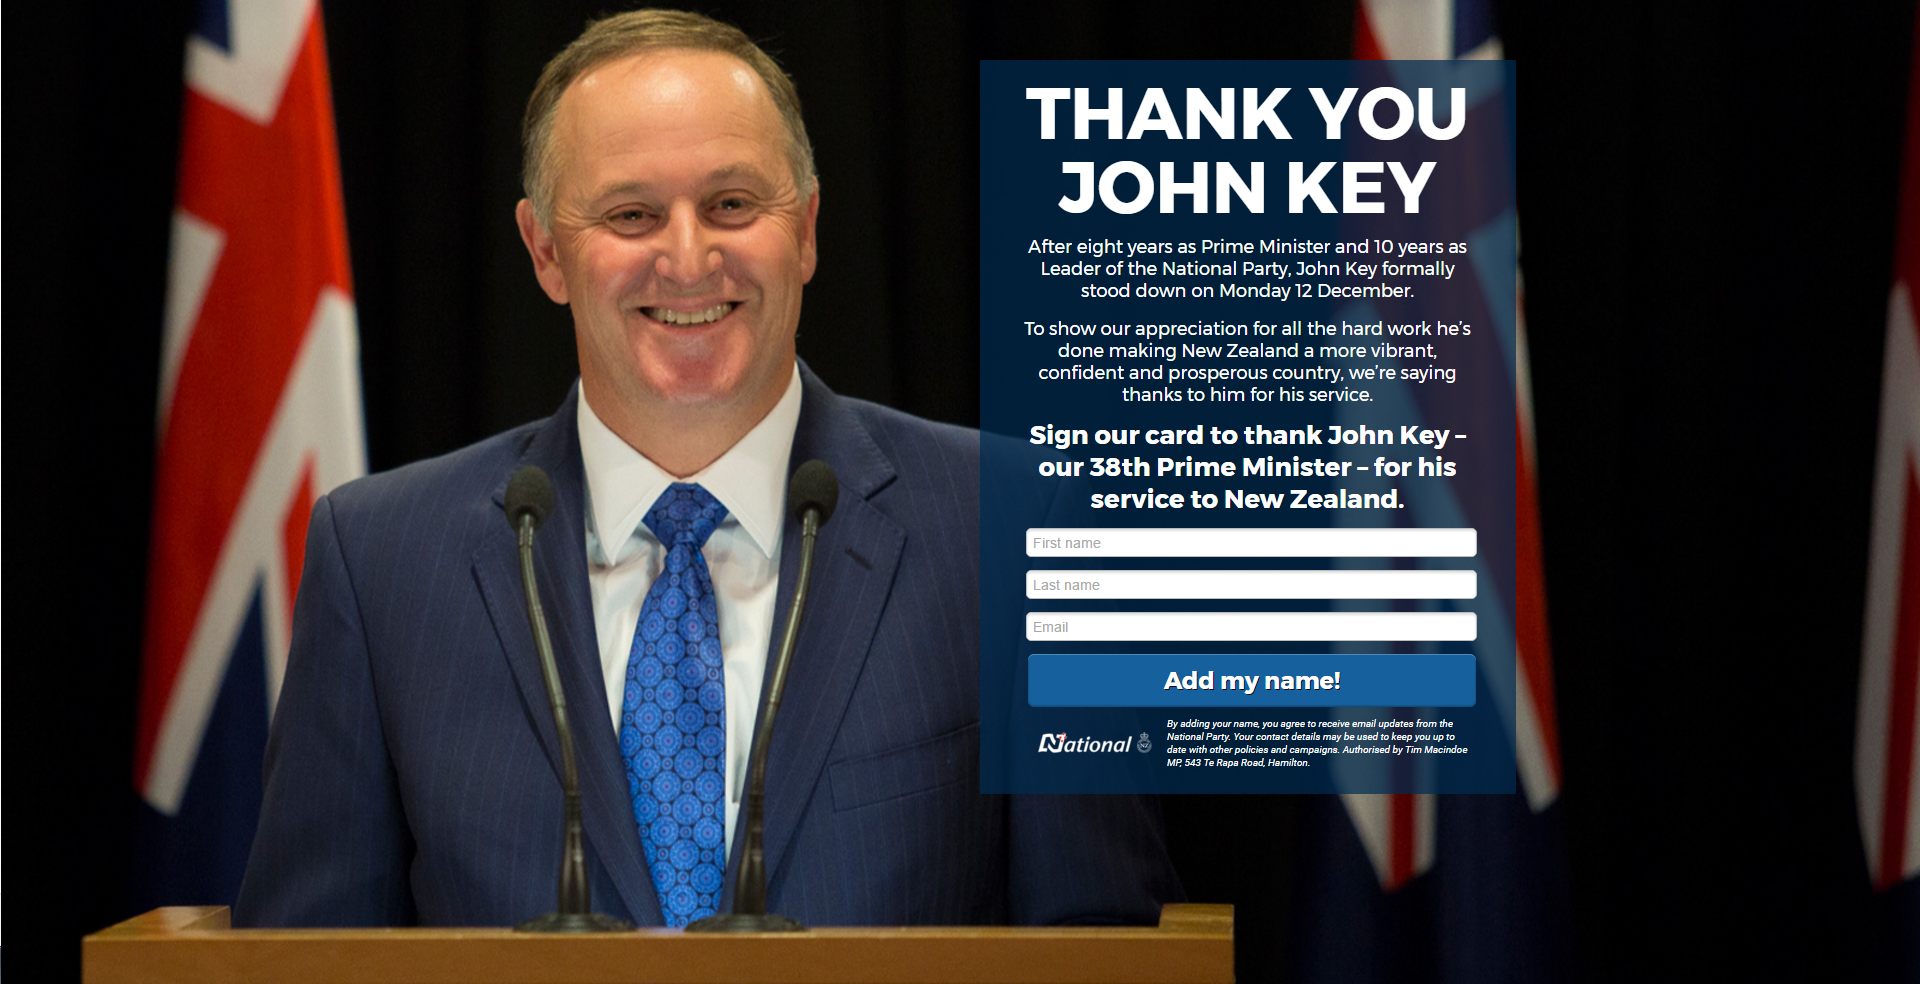 Thank You John Key Website Screen Grab.PNG